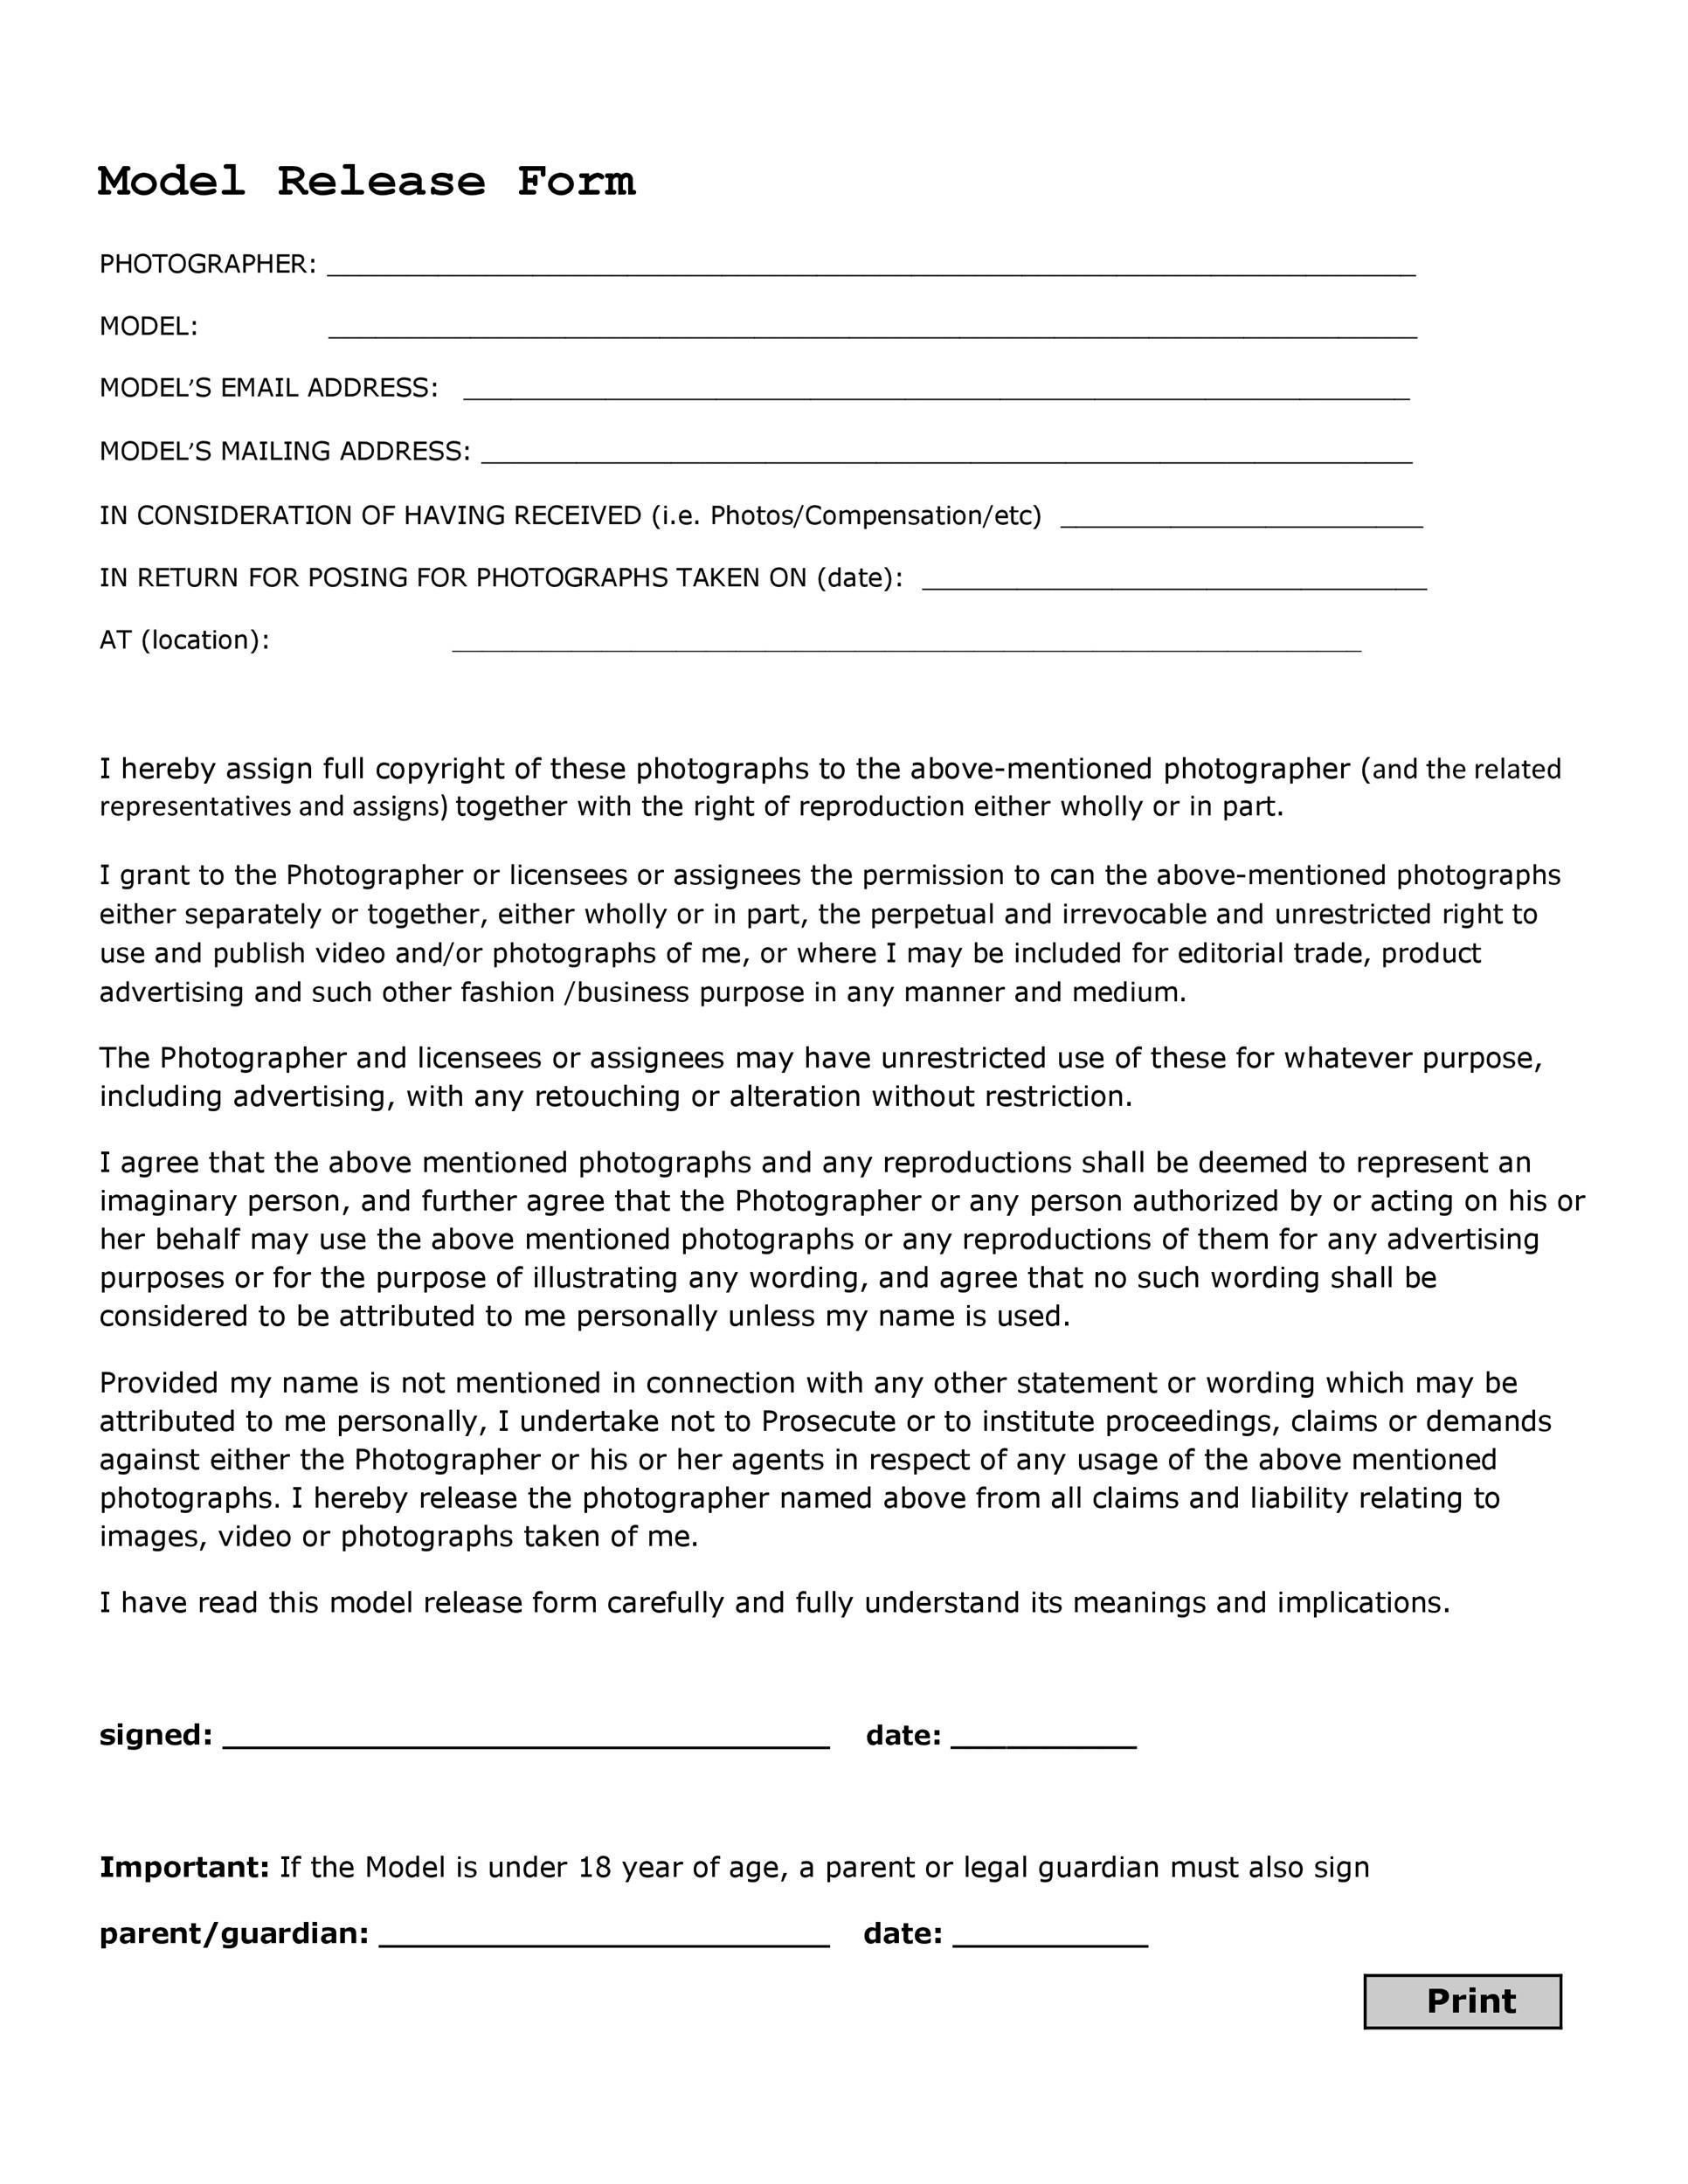 Free model release form 12